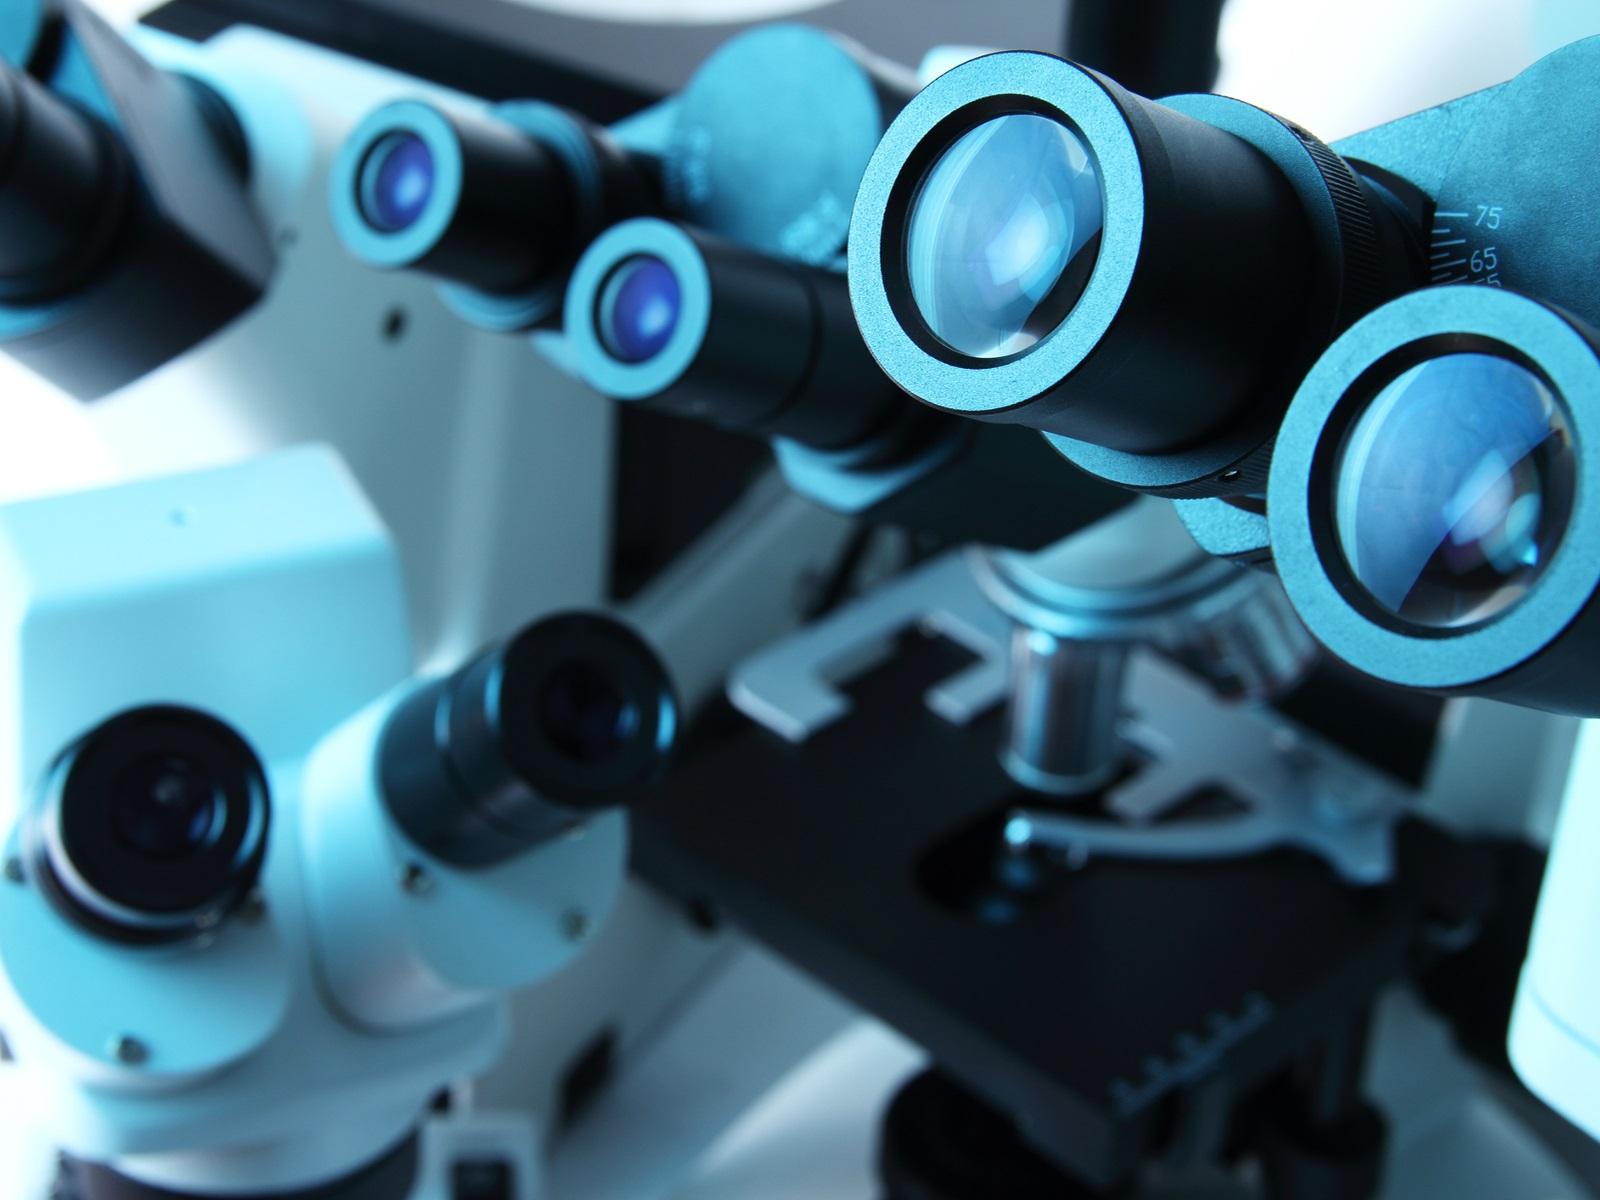 Stereomicroscope Technology